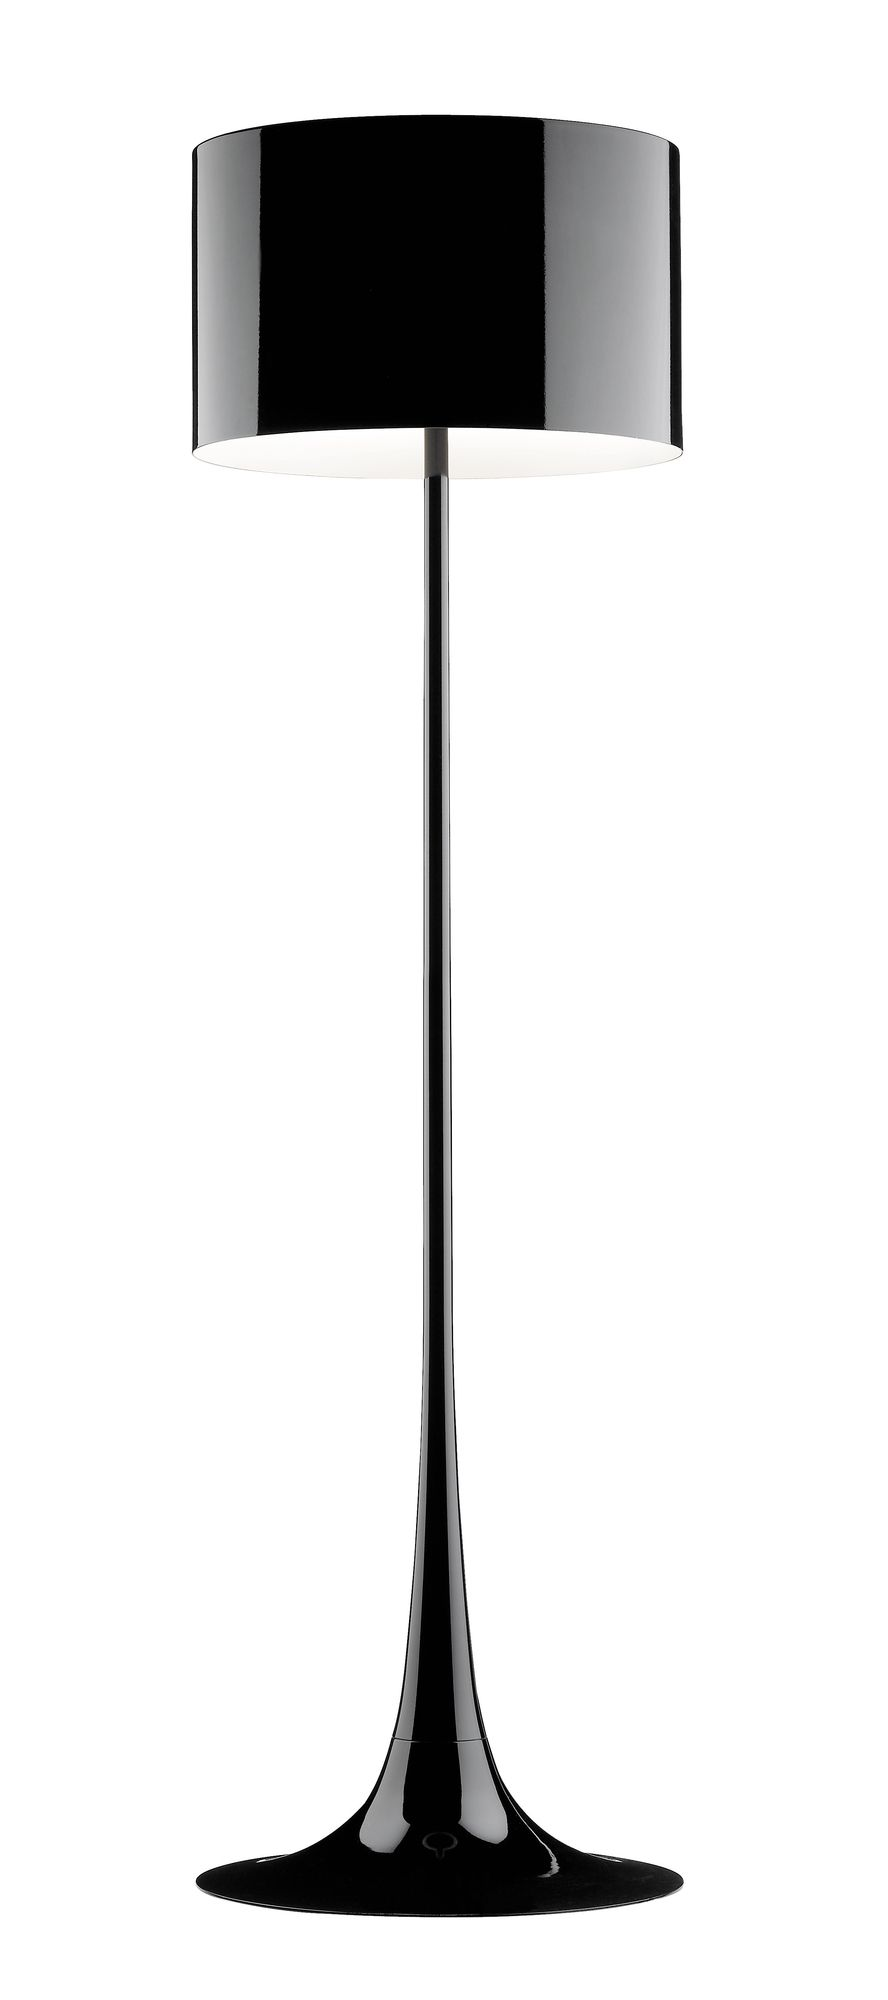 flos spun light f floor lamp classic shape modern materials  - flos spun light f floor lamp classic shape modern materials perfect